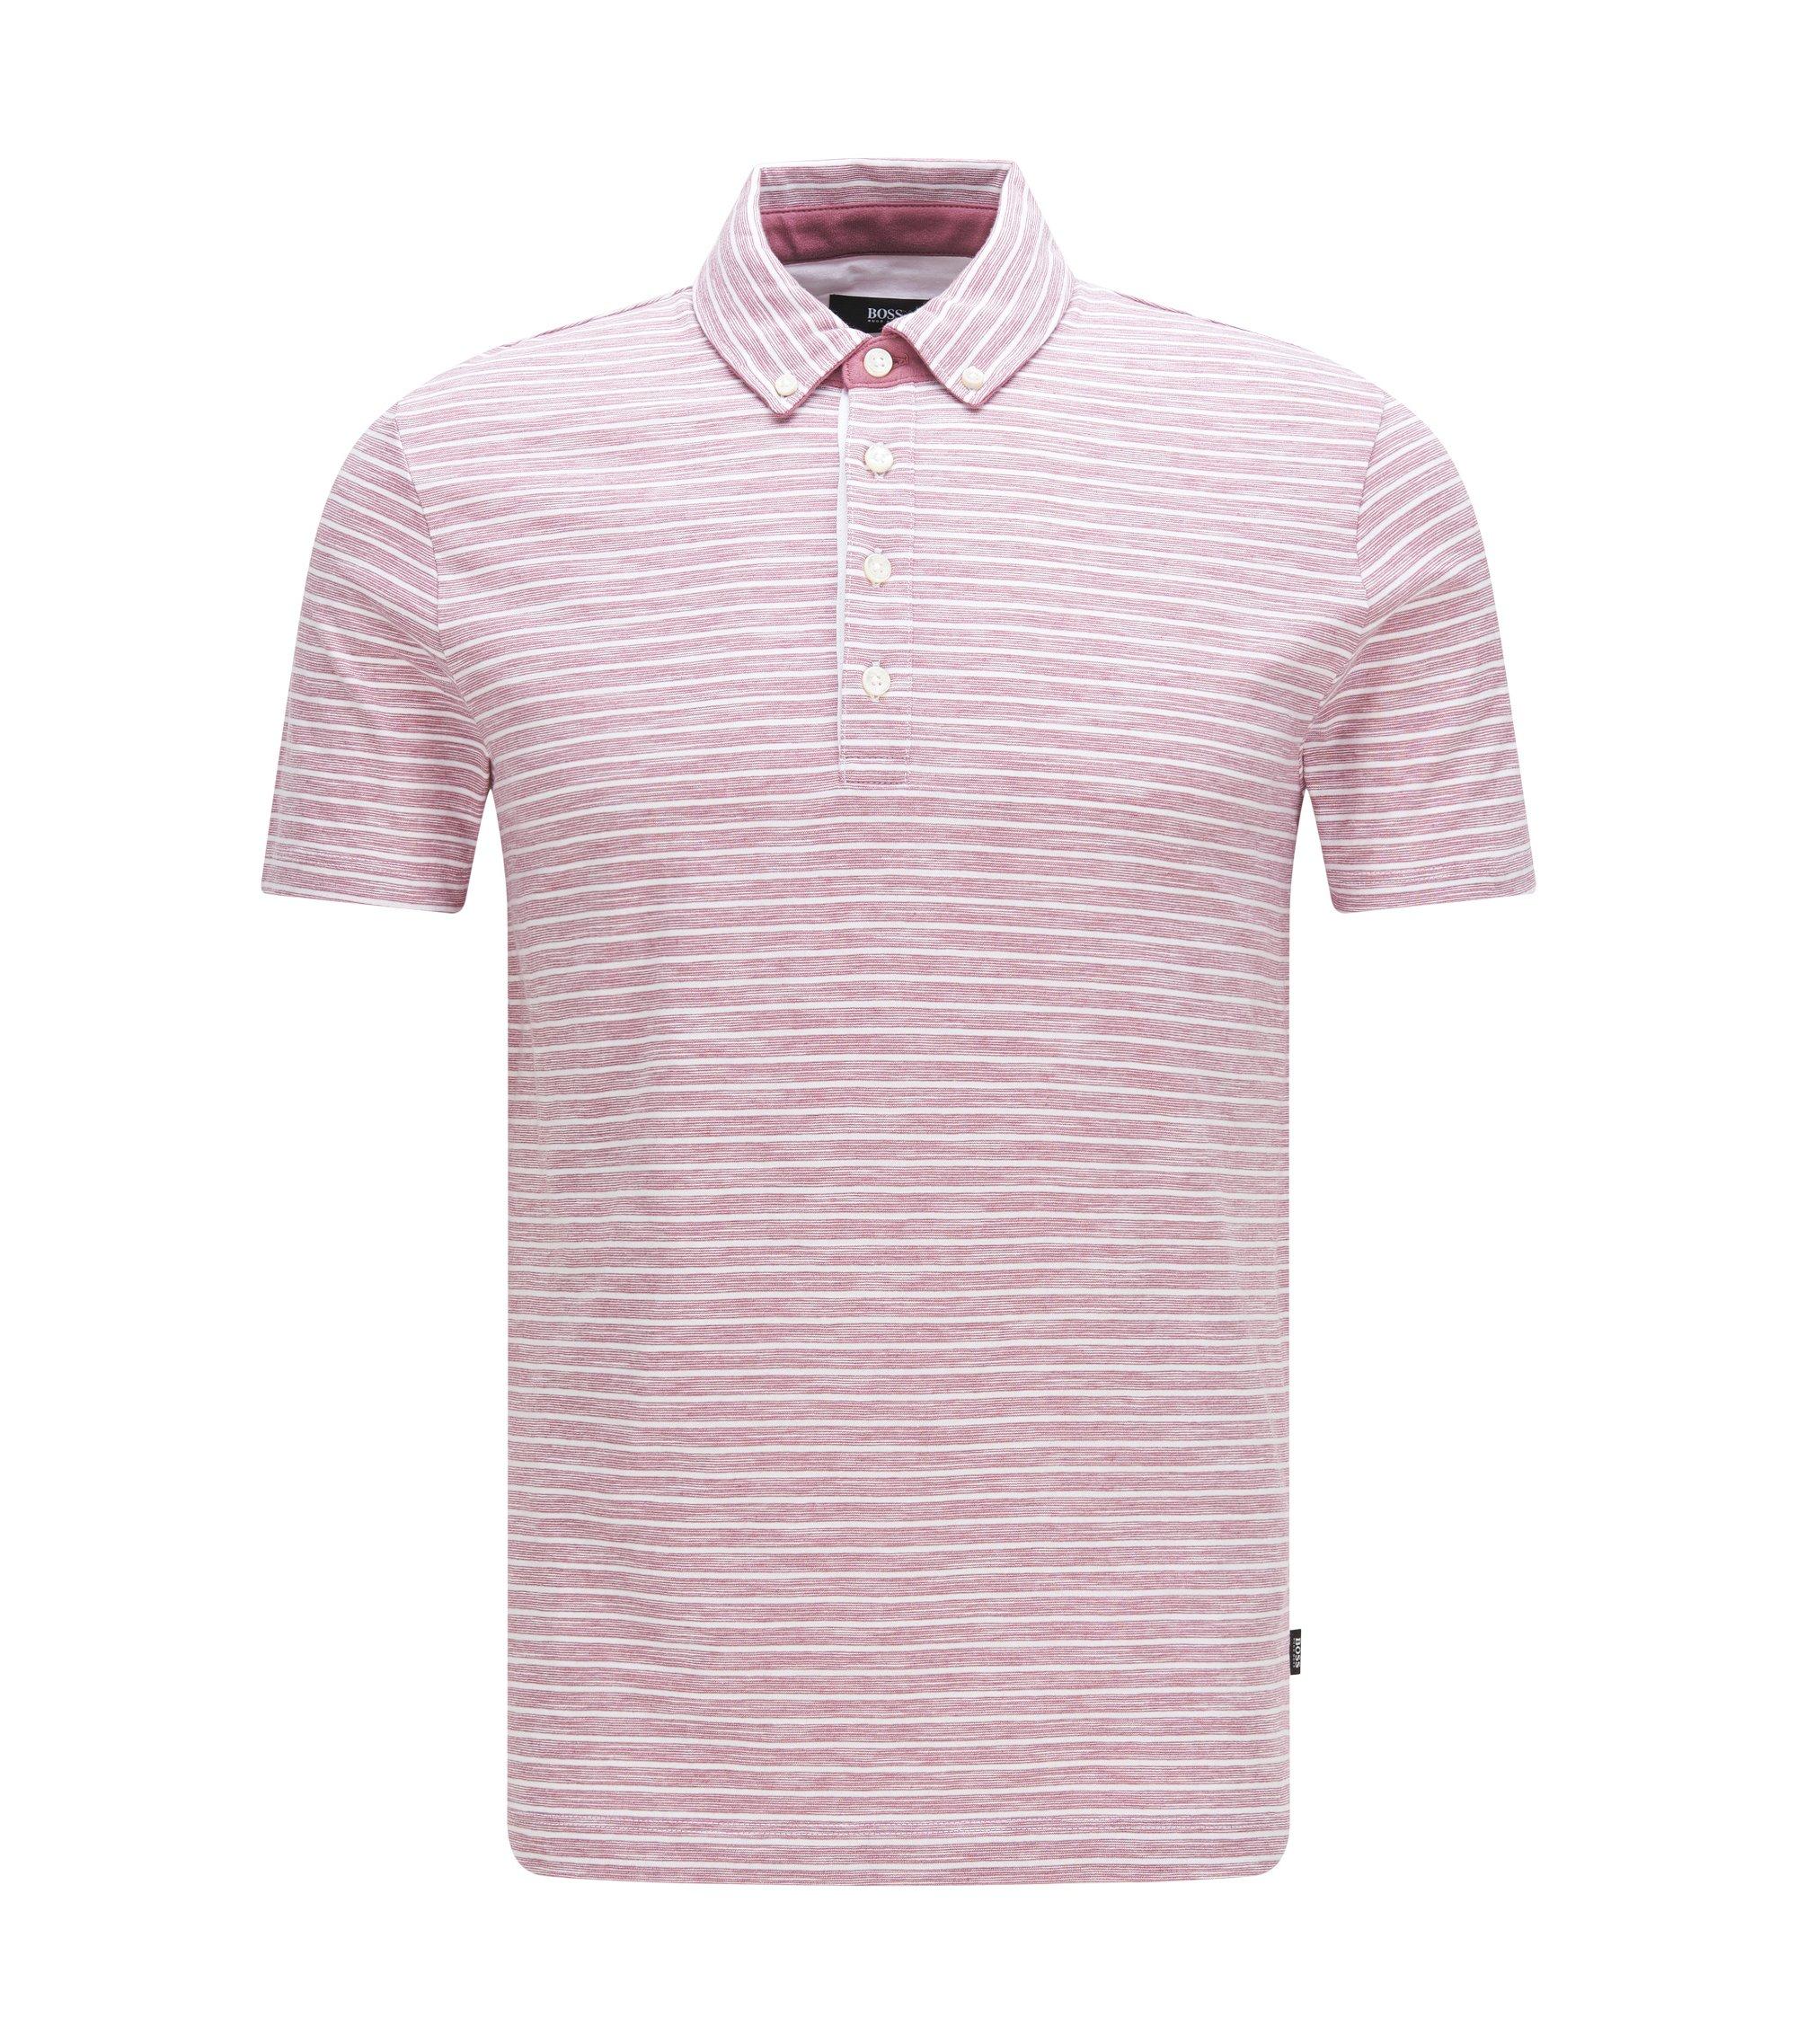 Cotton Striped Polo Shirt, Slim Fit   Platt, Pink